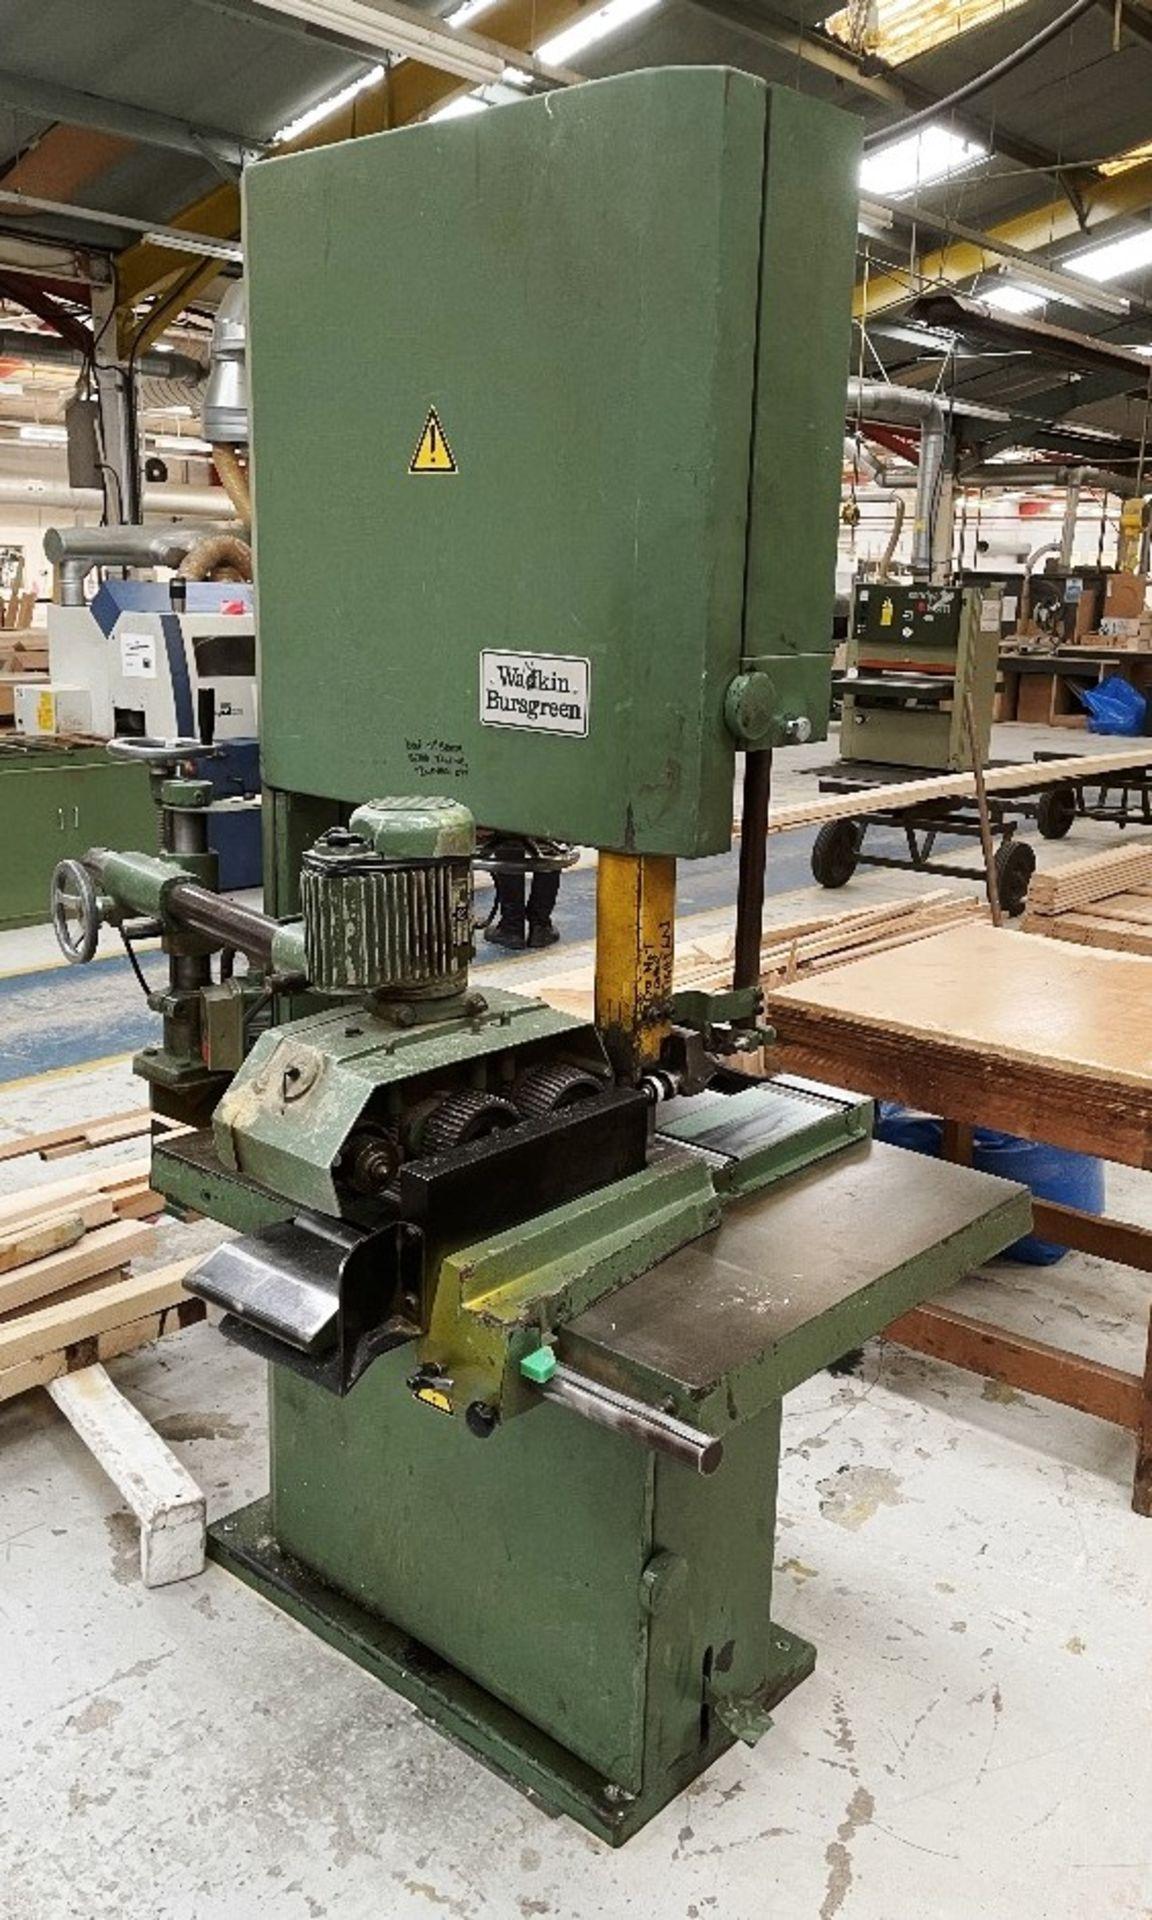 Wadkin Bursgreen Vertical Bandsaw w/ Power Feed